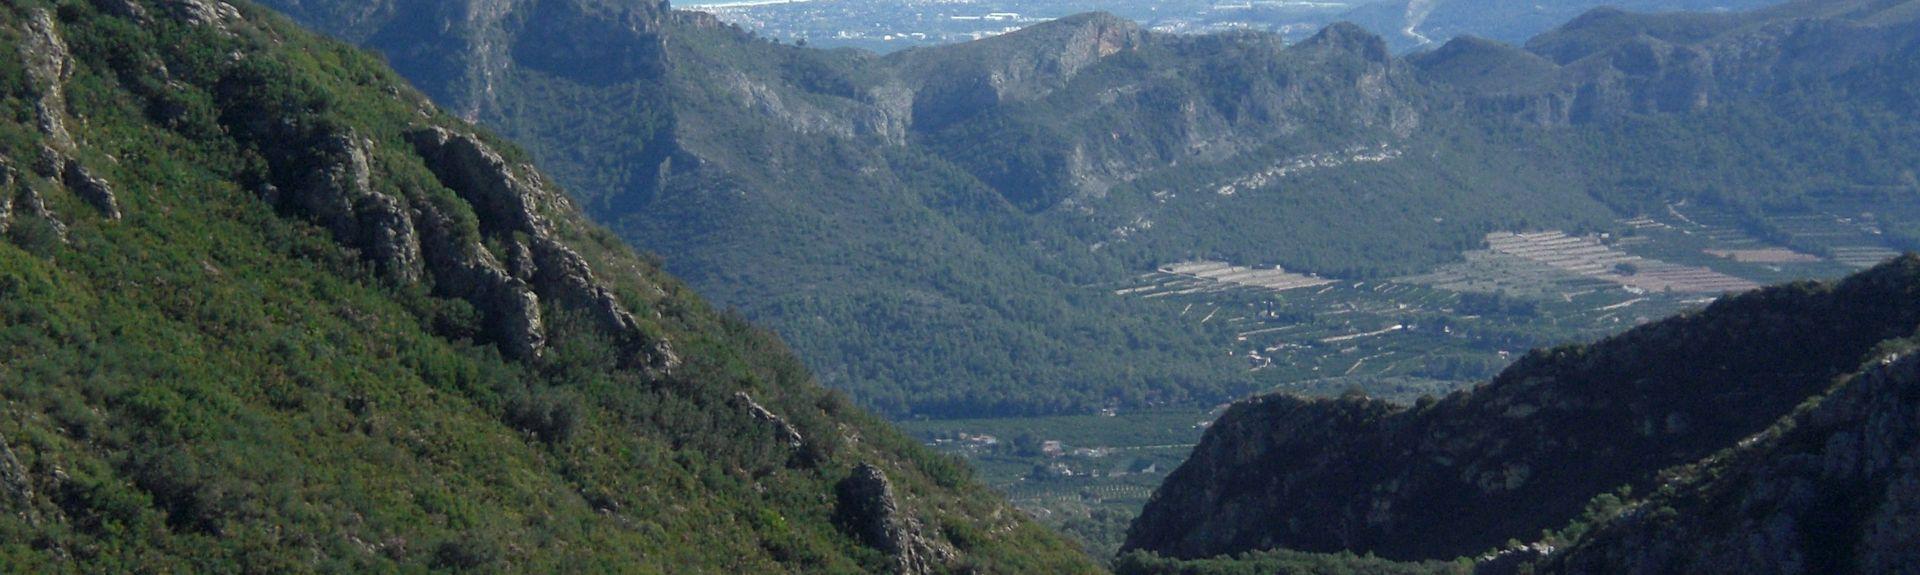 Ribera Baixa, Comunità Valenzana, Spagna